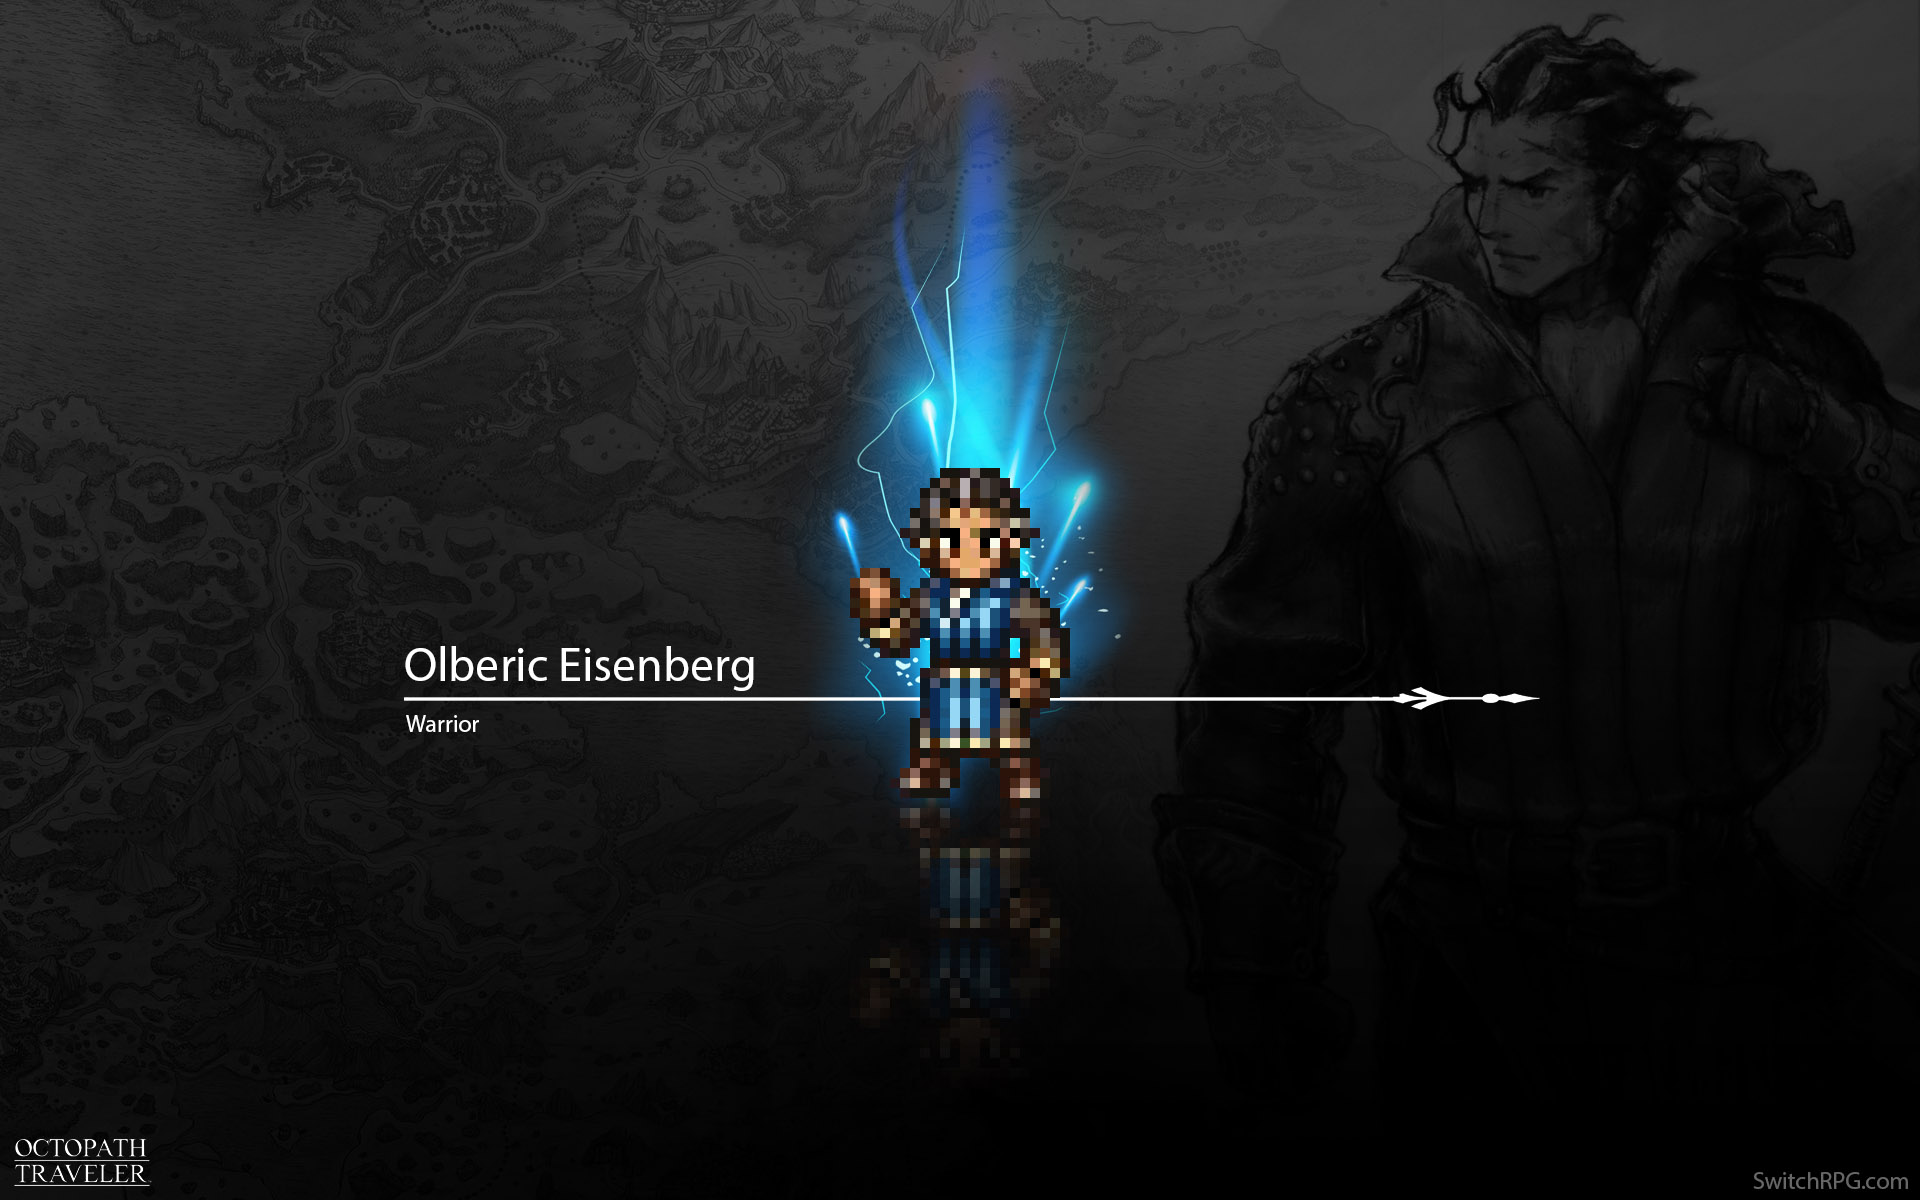 Octopath Traveler Character Wallpaper | Switch RPG